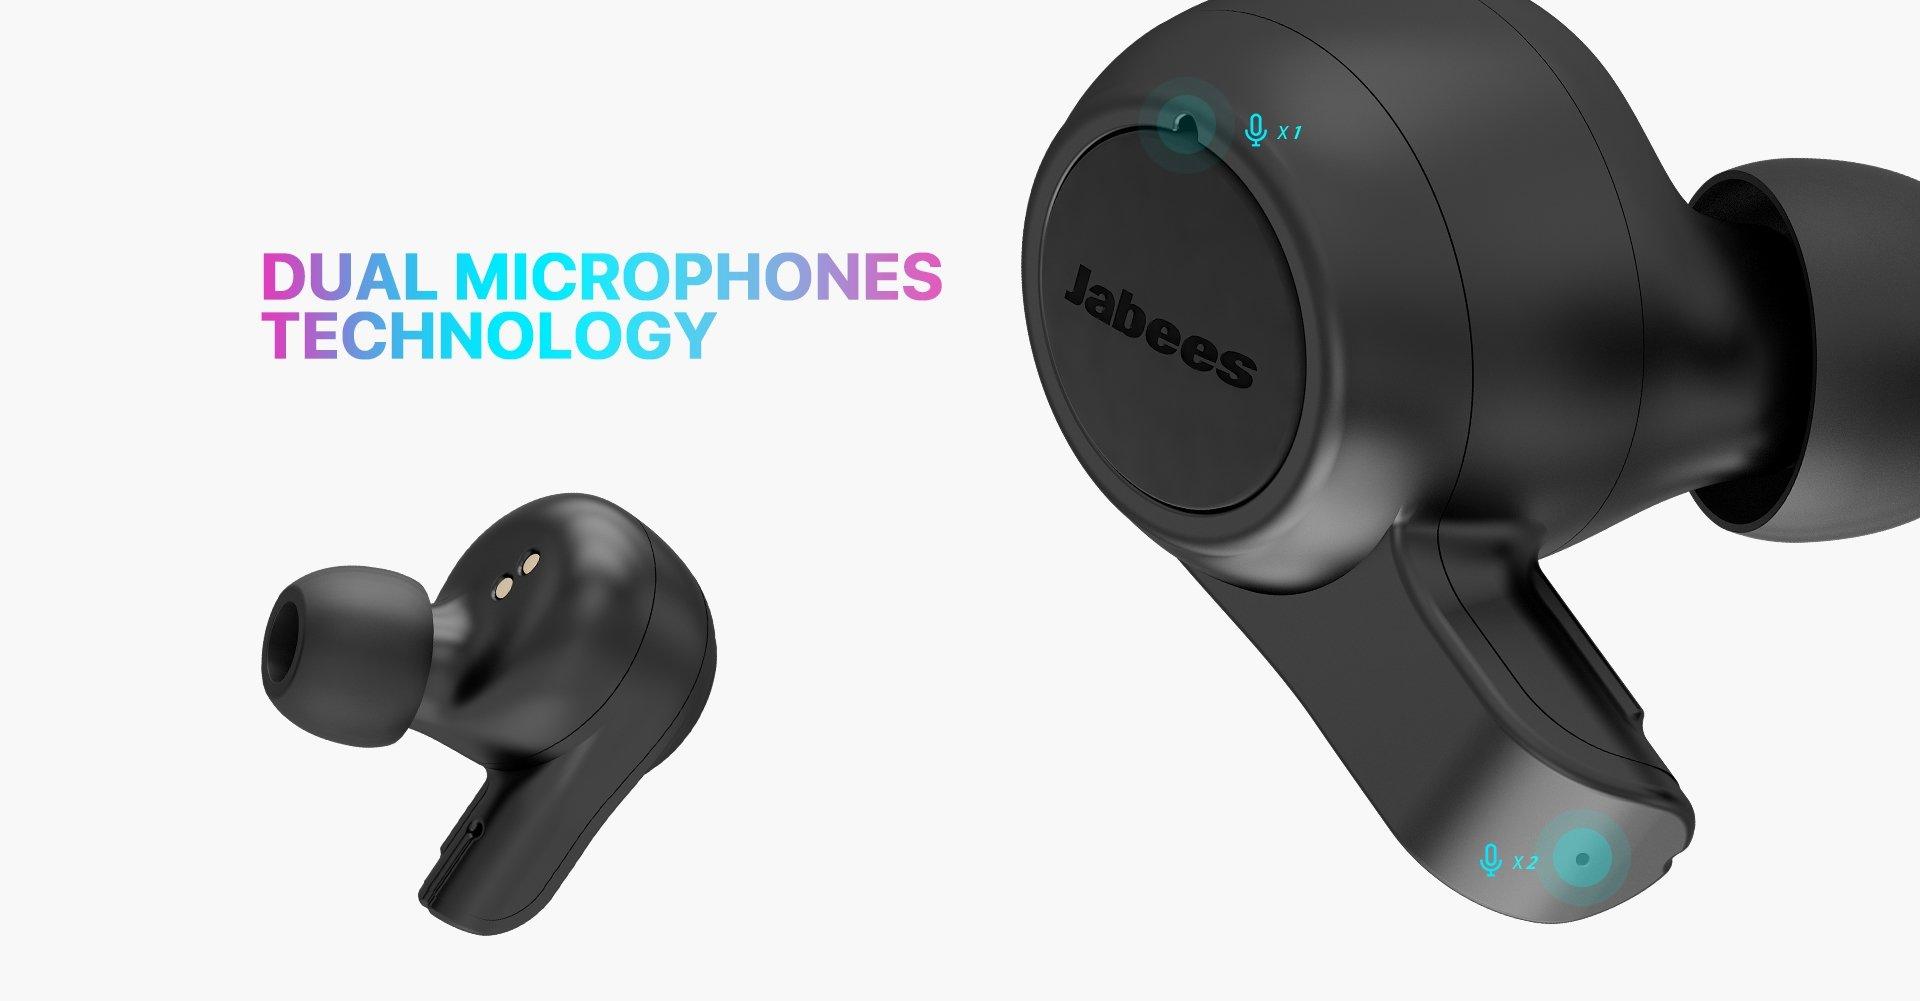 Jabees Firefly 2 Black Touch TWS Earbuds Waterproof & Dustproof IPX7 9